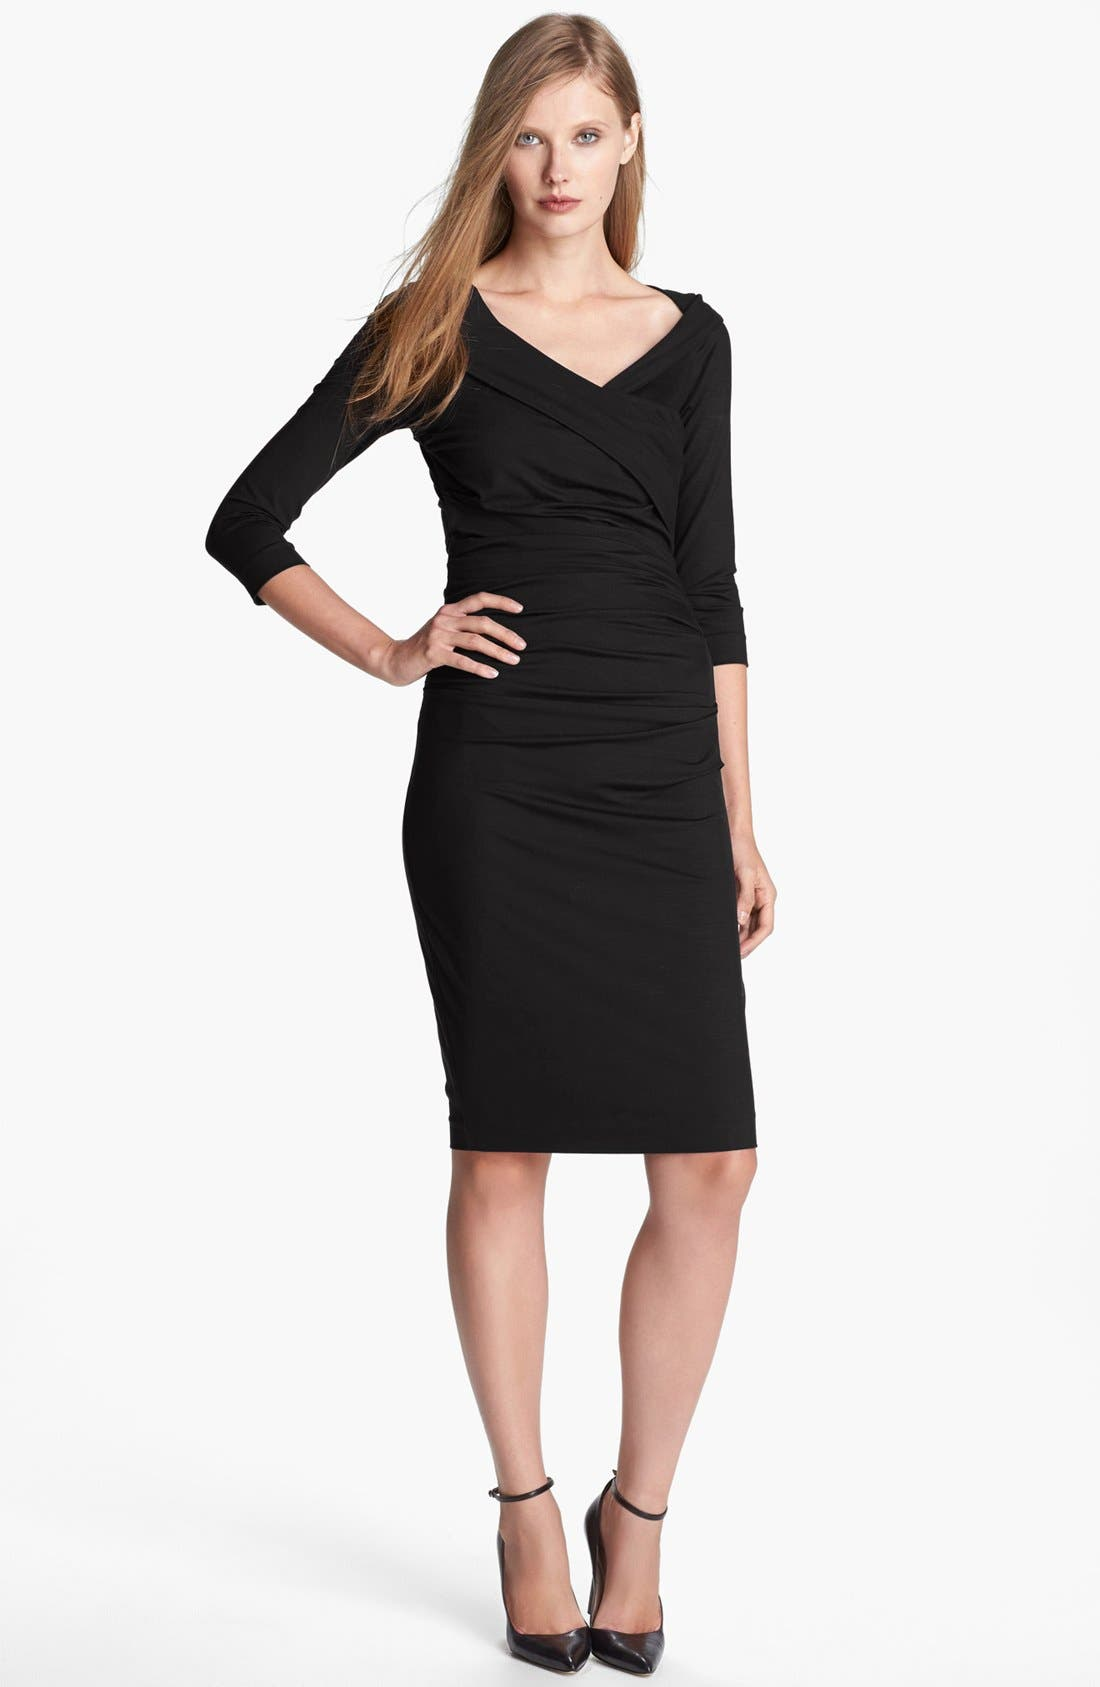 Alternate Image 1 Selected - Diane von Furstenberg 'Bentley' Ruched Dress